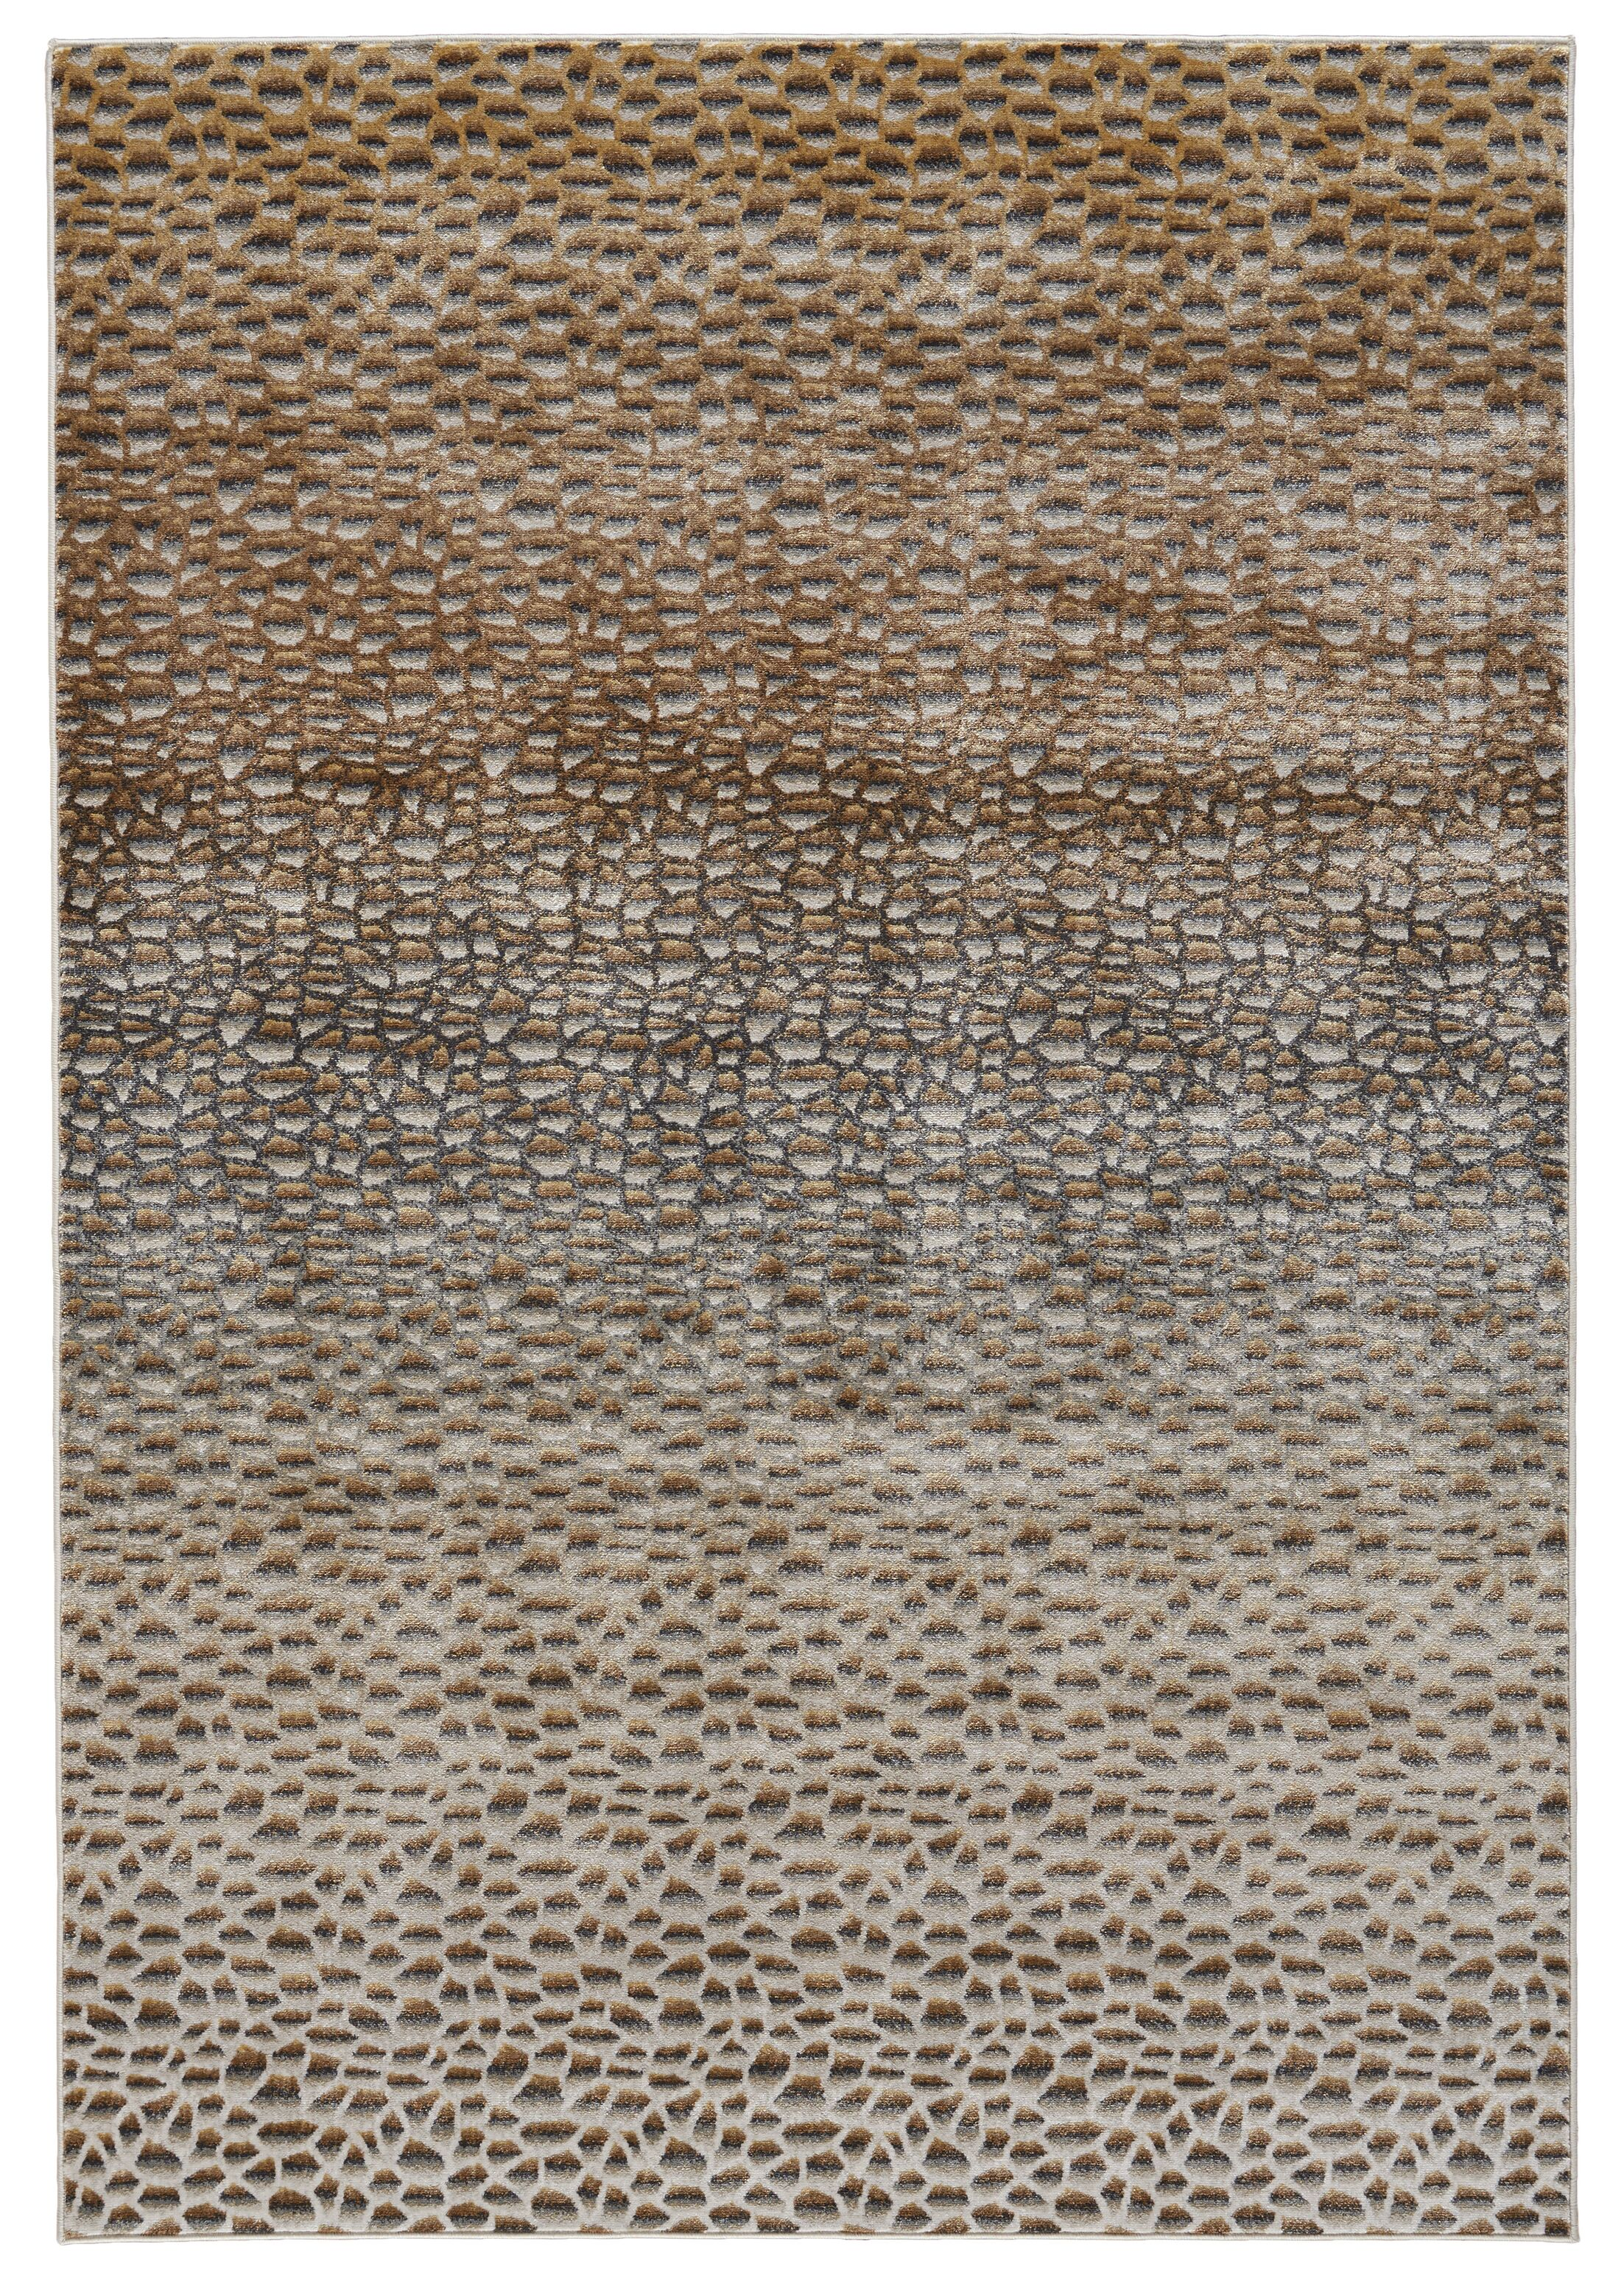 JoLinda Dark Gold Area Rug Rug Size: Rectangle 10' x 13'2